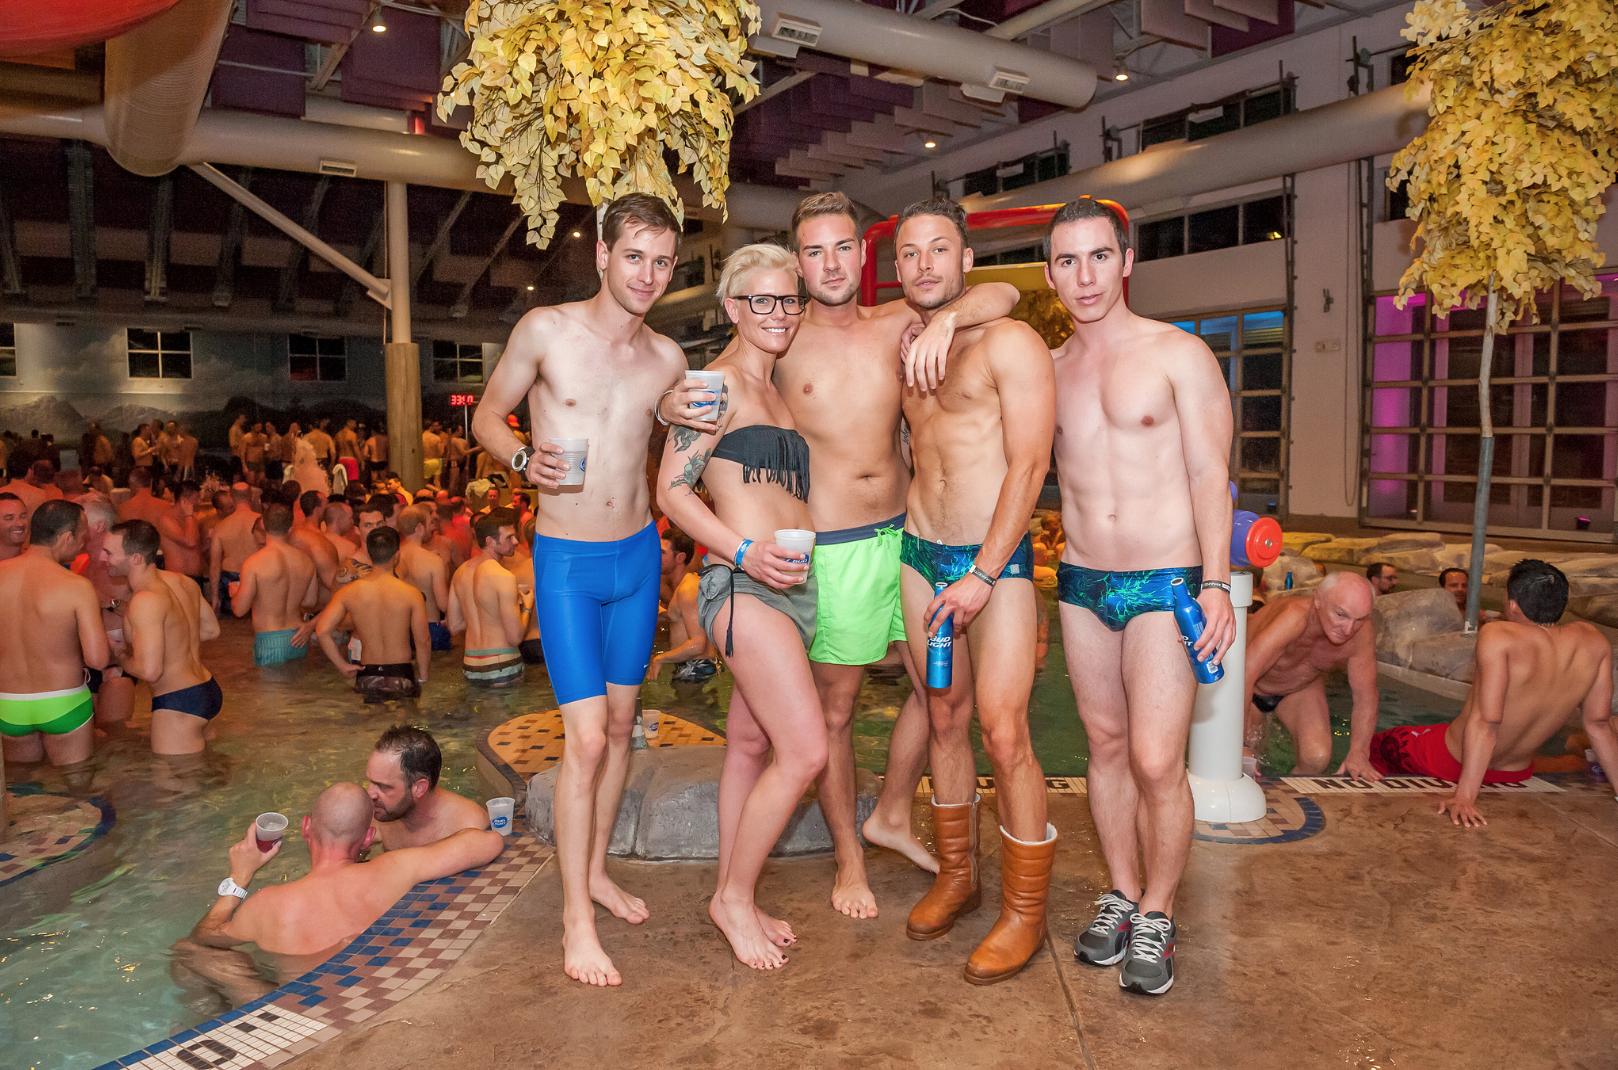 free gay porn marine jerk off